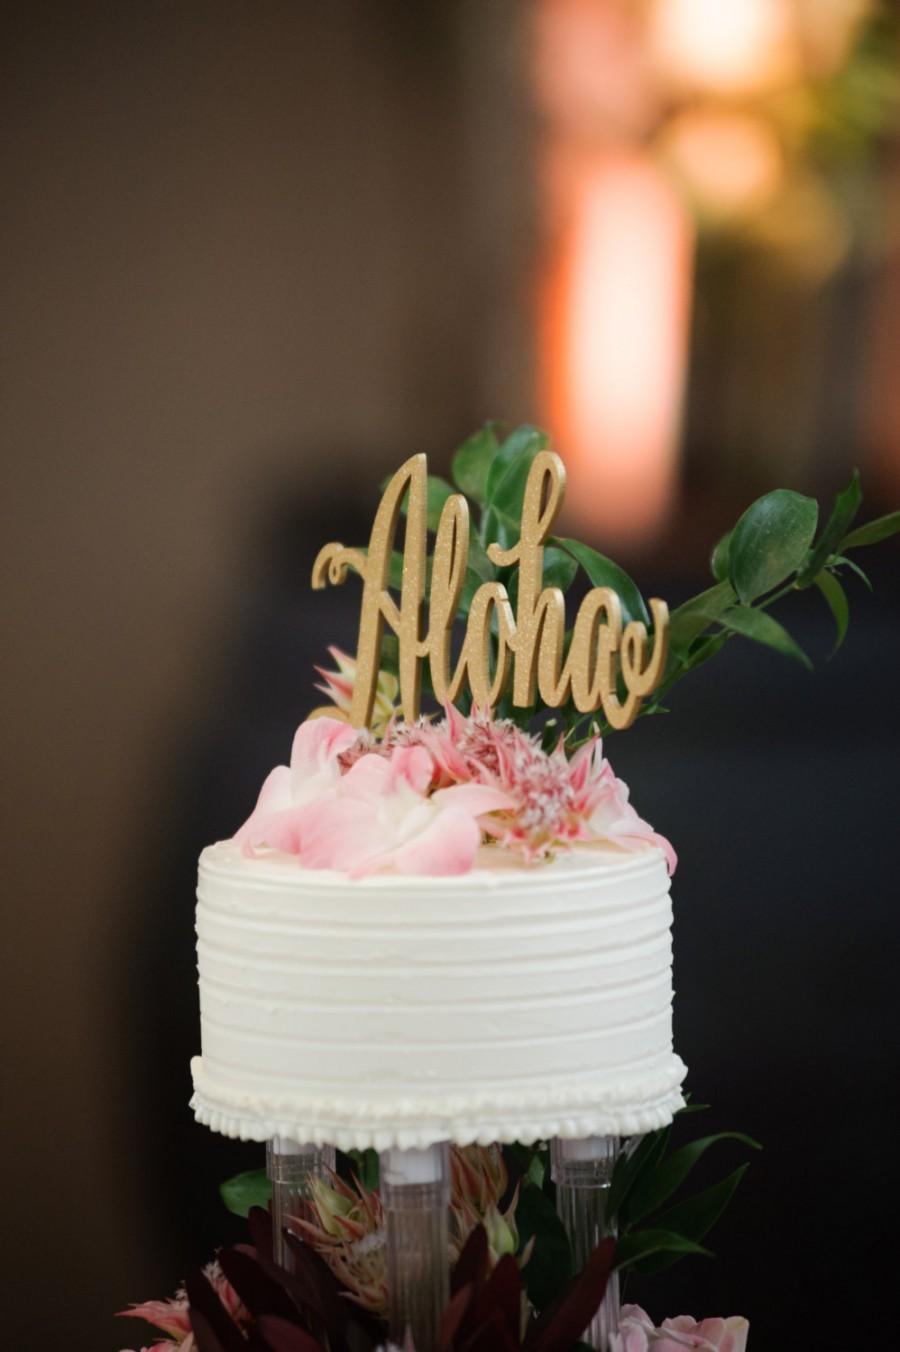 Mariage - Aloha Cake Topper, Cake Topper for Wedding, Wedding Cake Topper, Hawaii Wedding Cake Topper, Hawaii Party, Hawaii Party, Aloha, Hawaii Decor